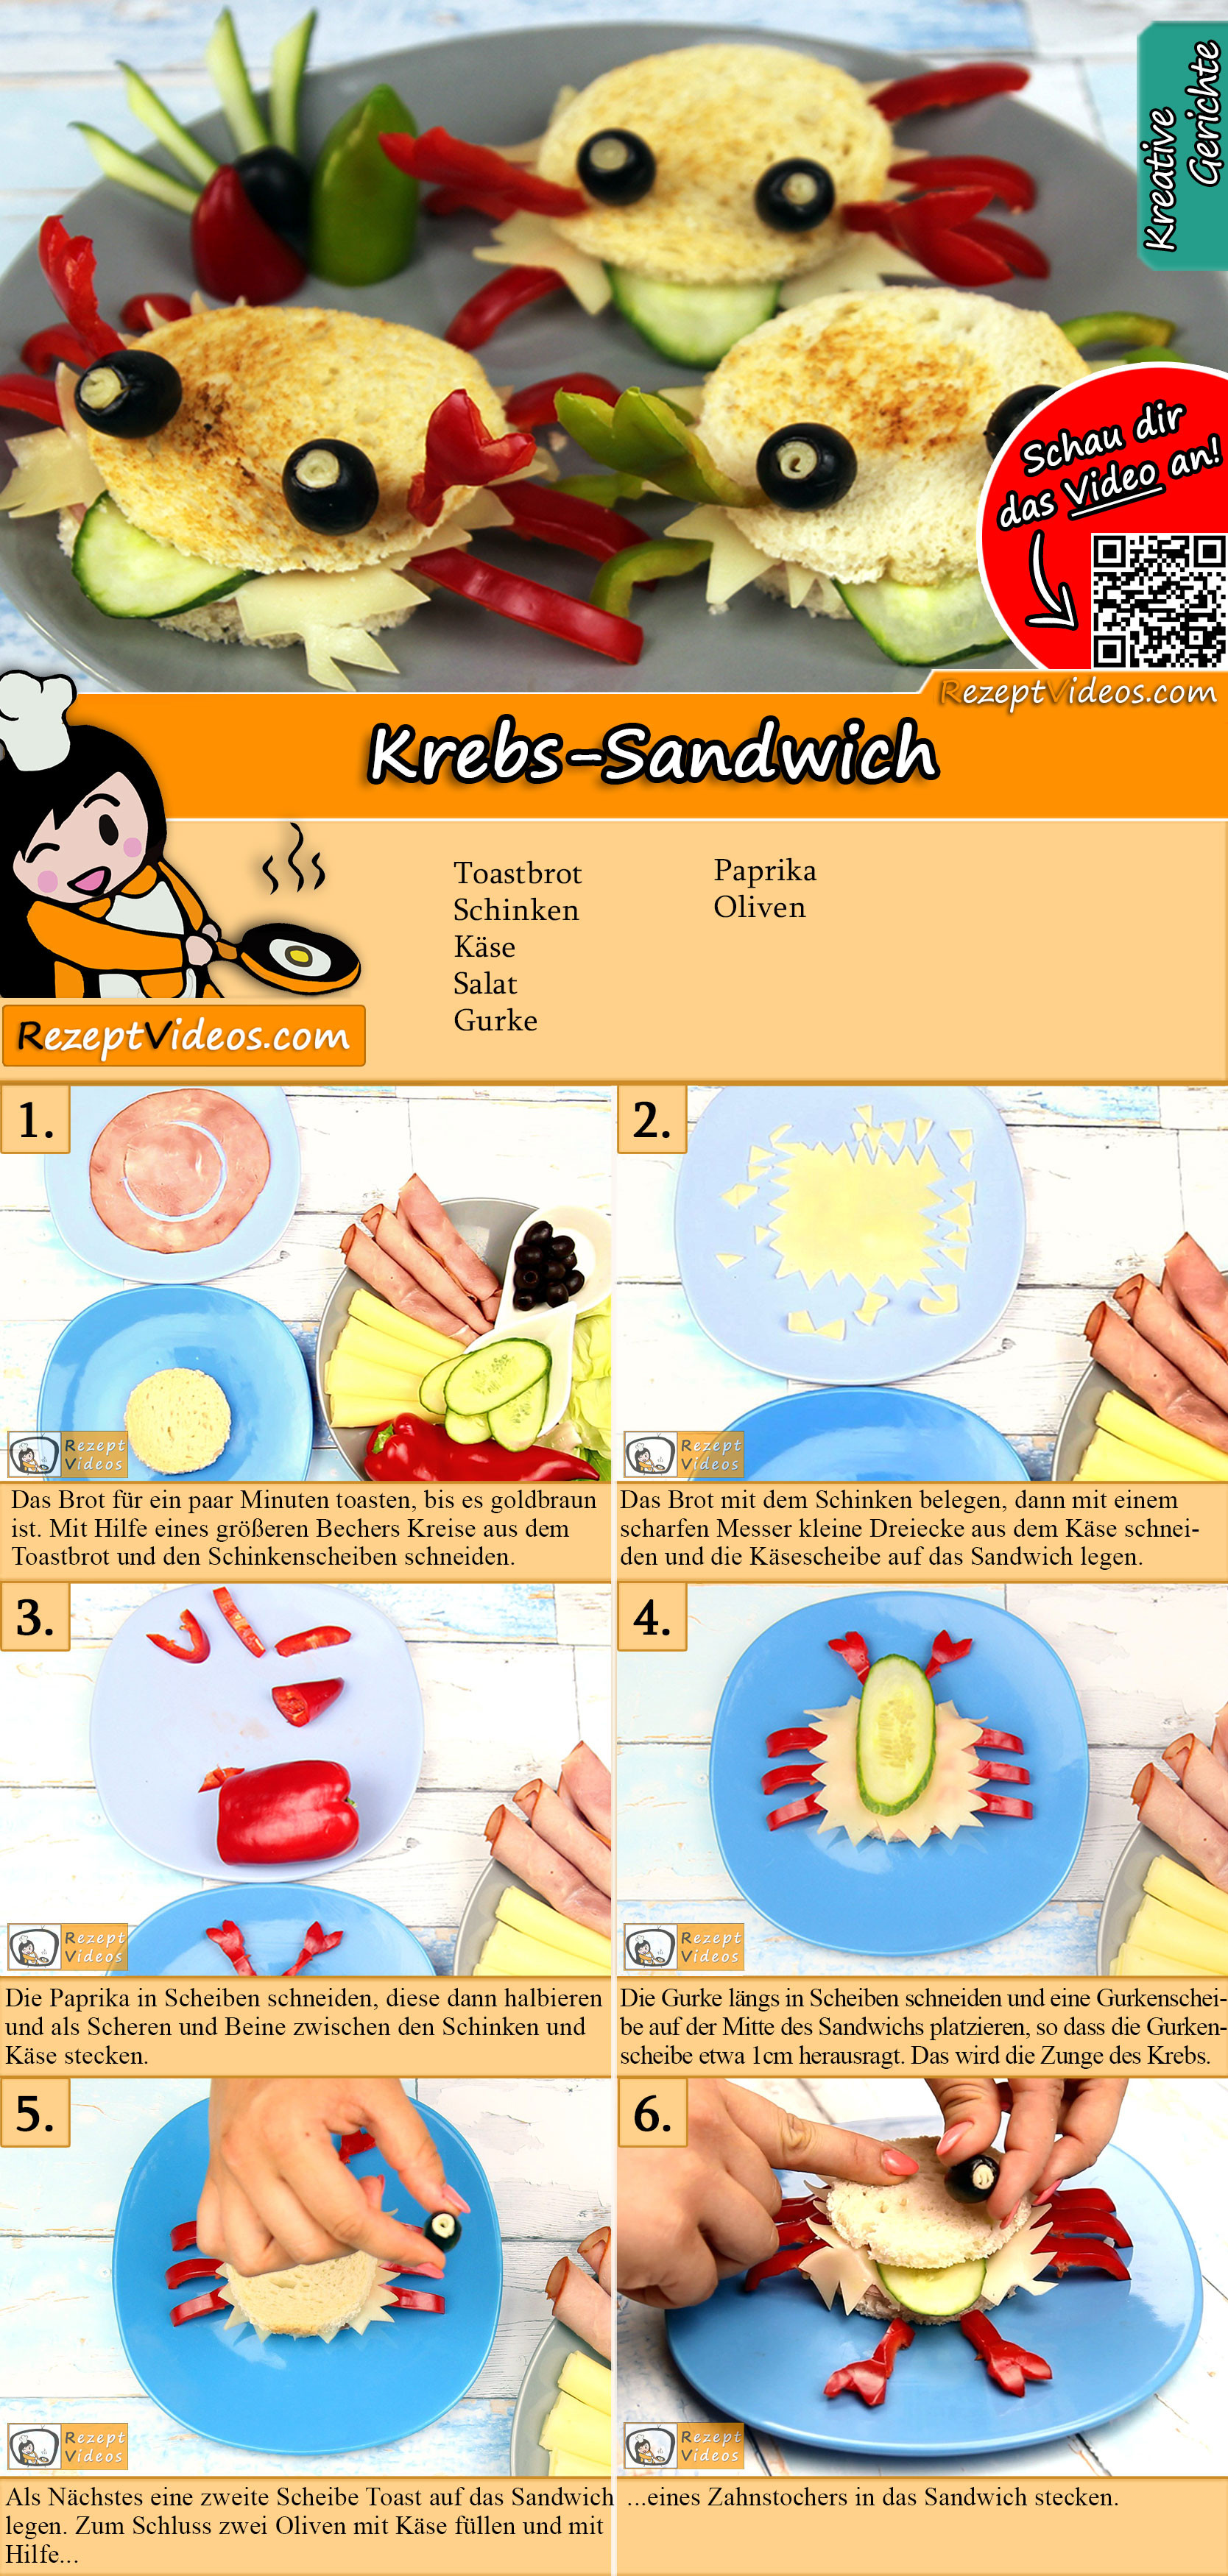 Krebs-Sandwich Rezept mit Video